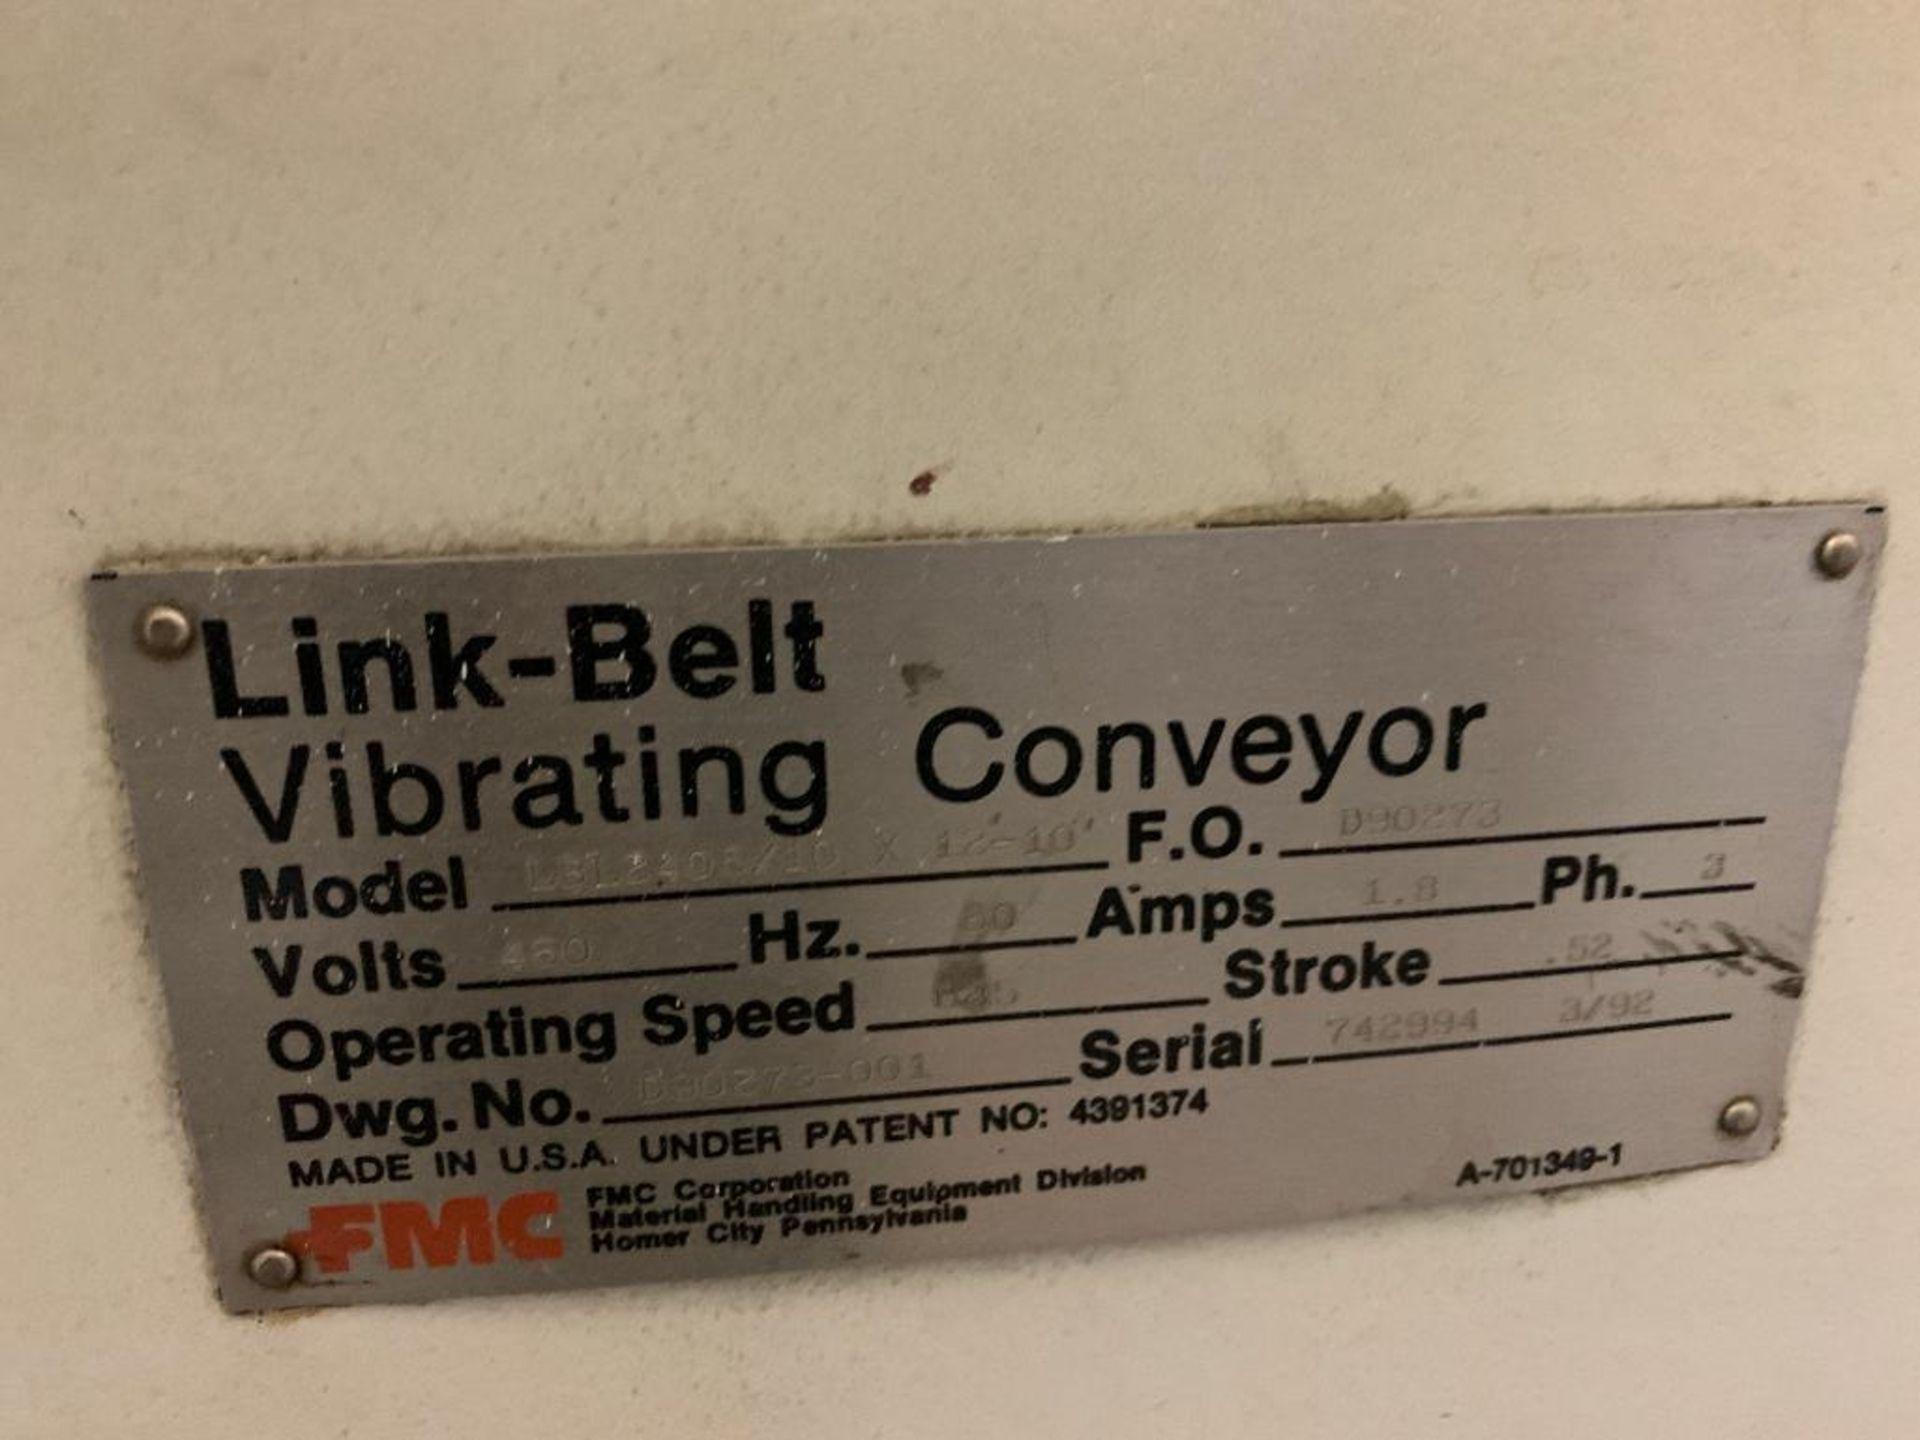 1992 Link-Belt vibratory conveyor, model LBL2405-10X12-10 - Image 19 of 34